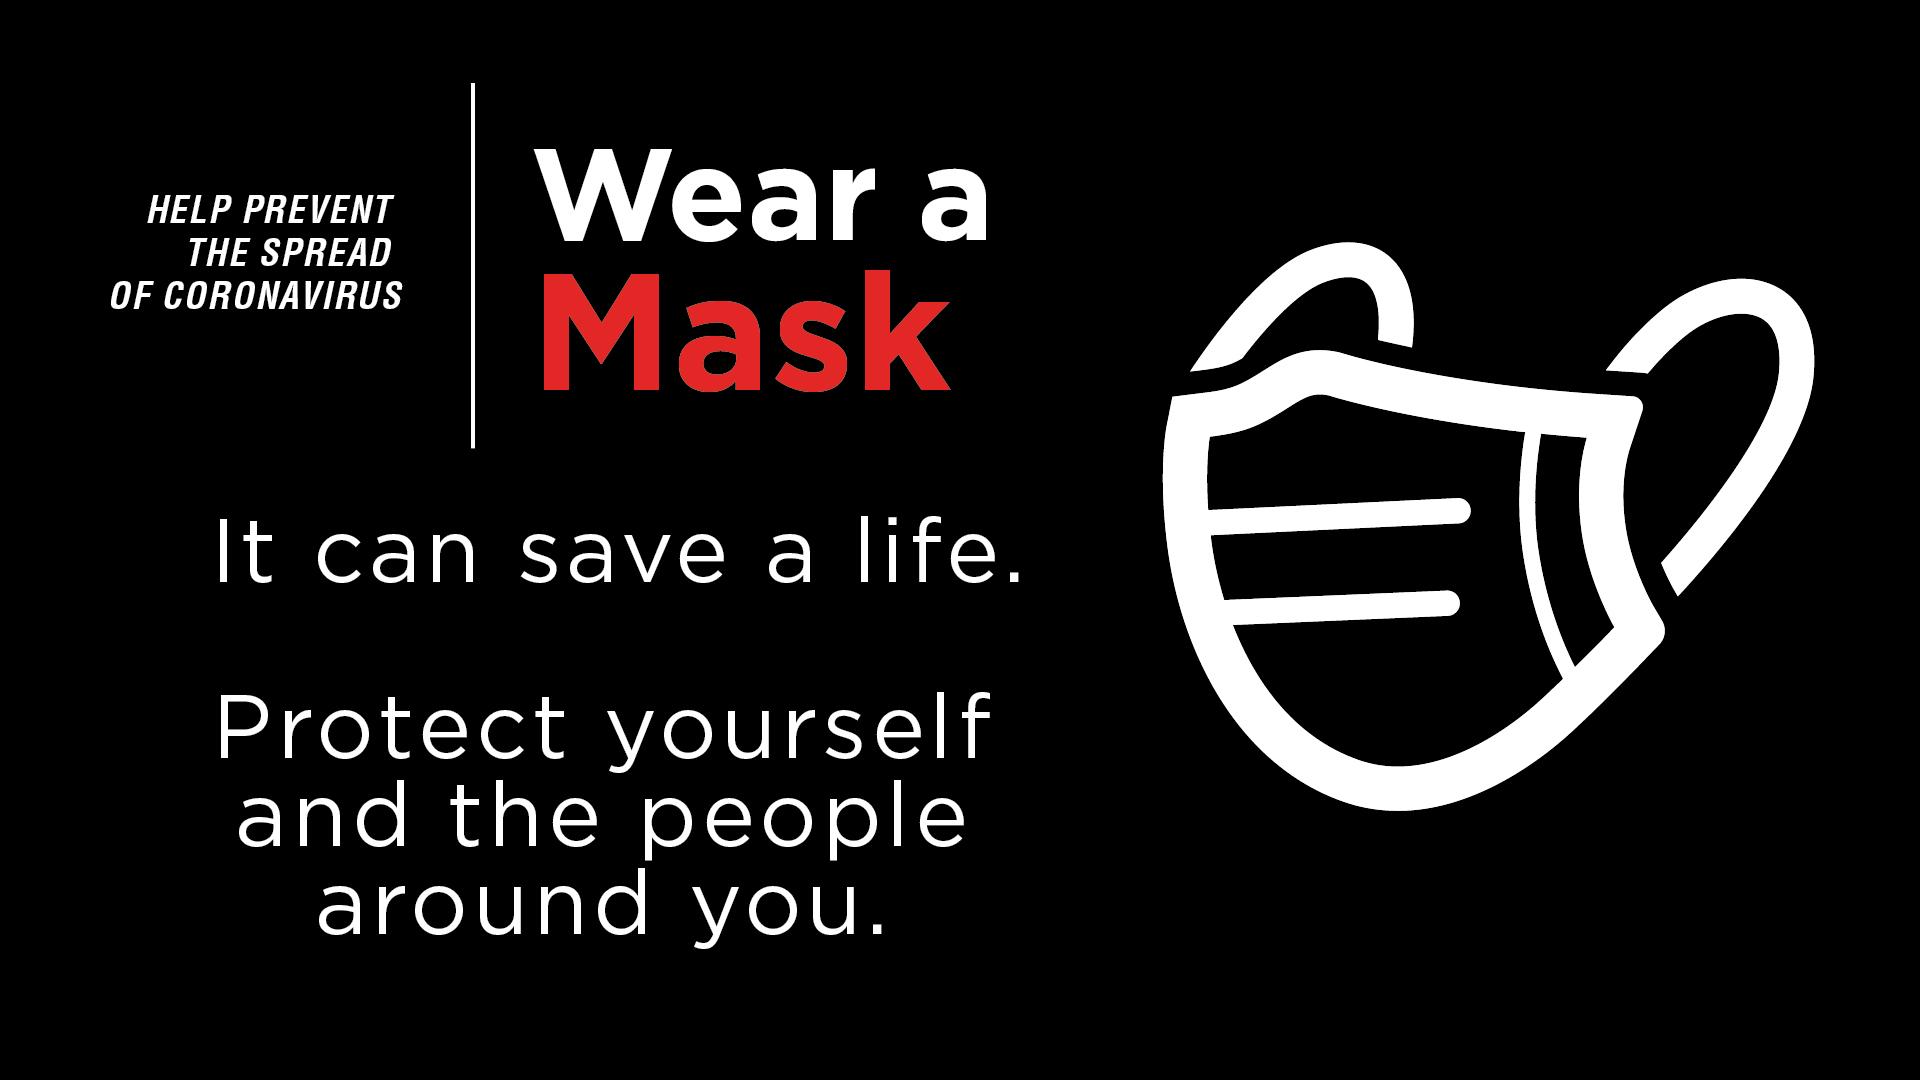 Wear a Mask Digital Signage Image